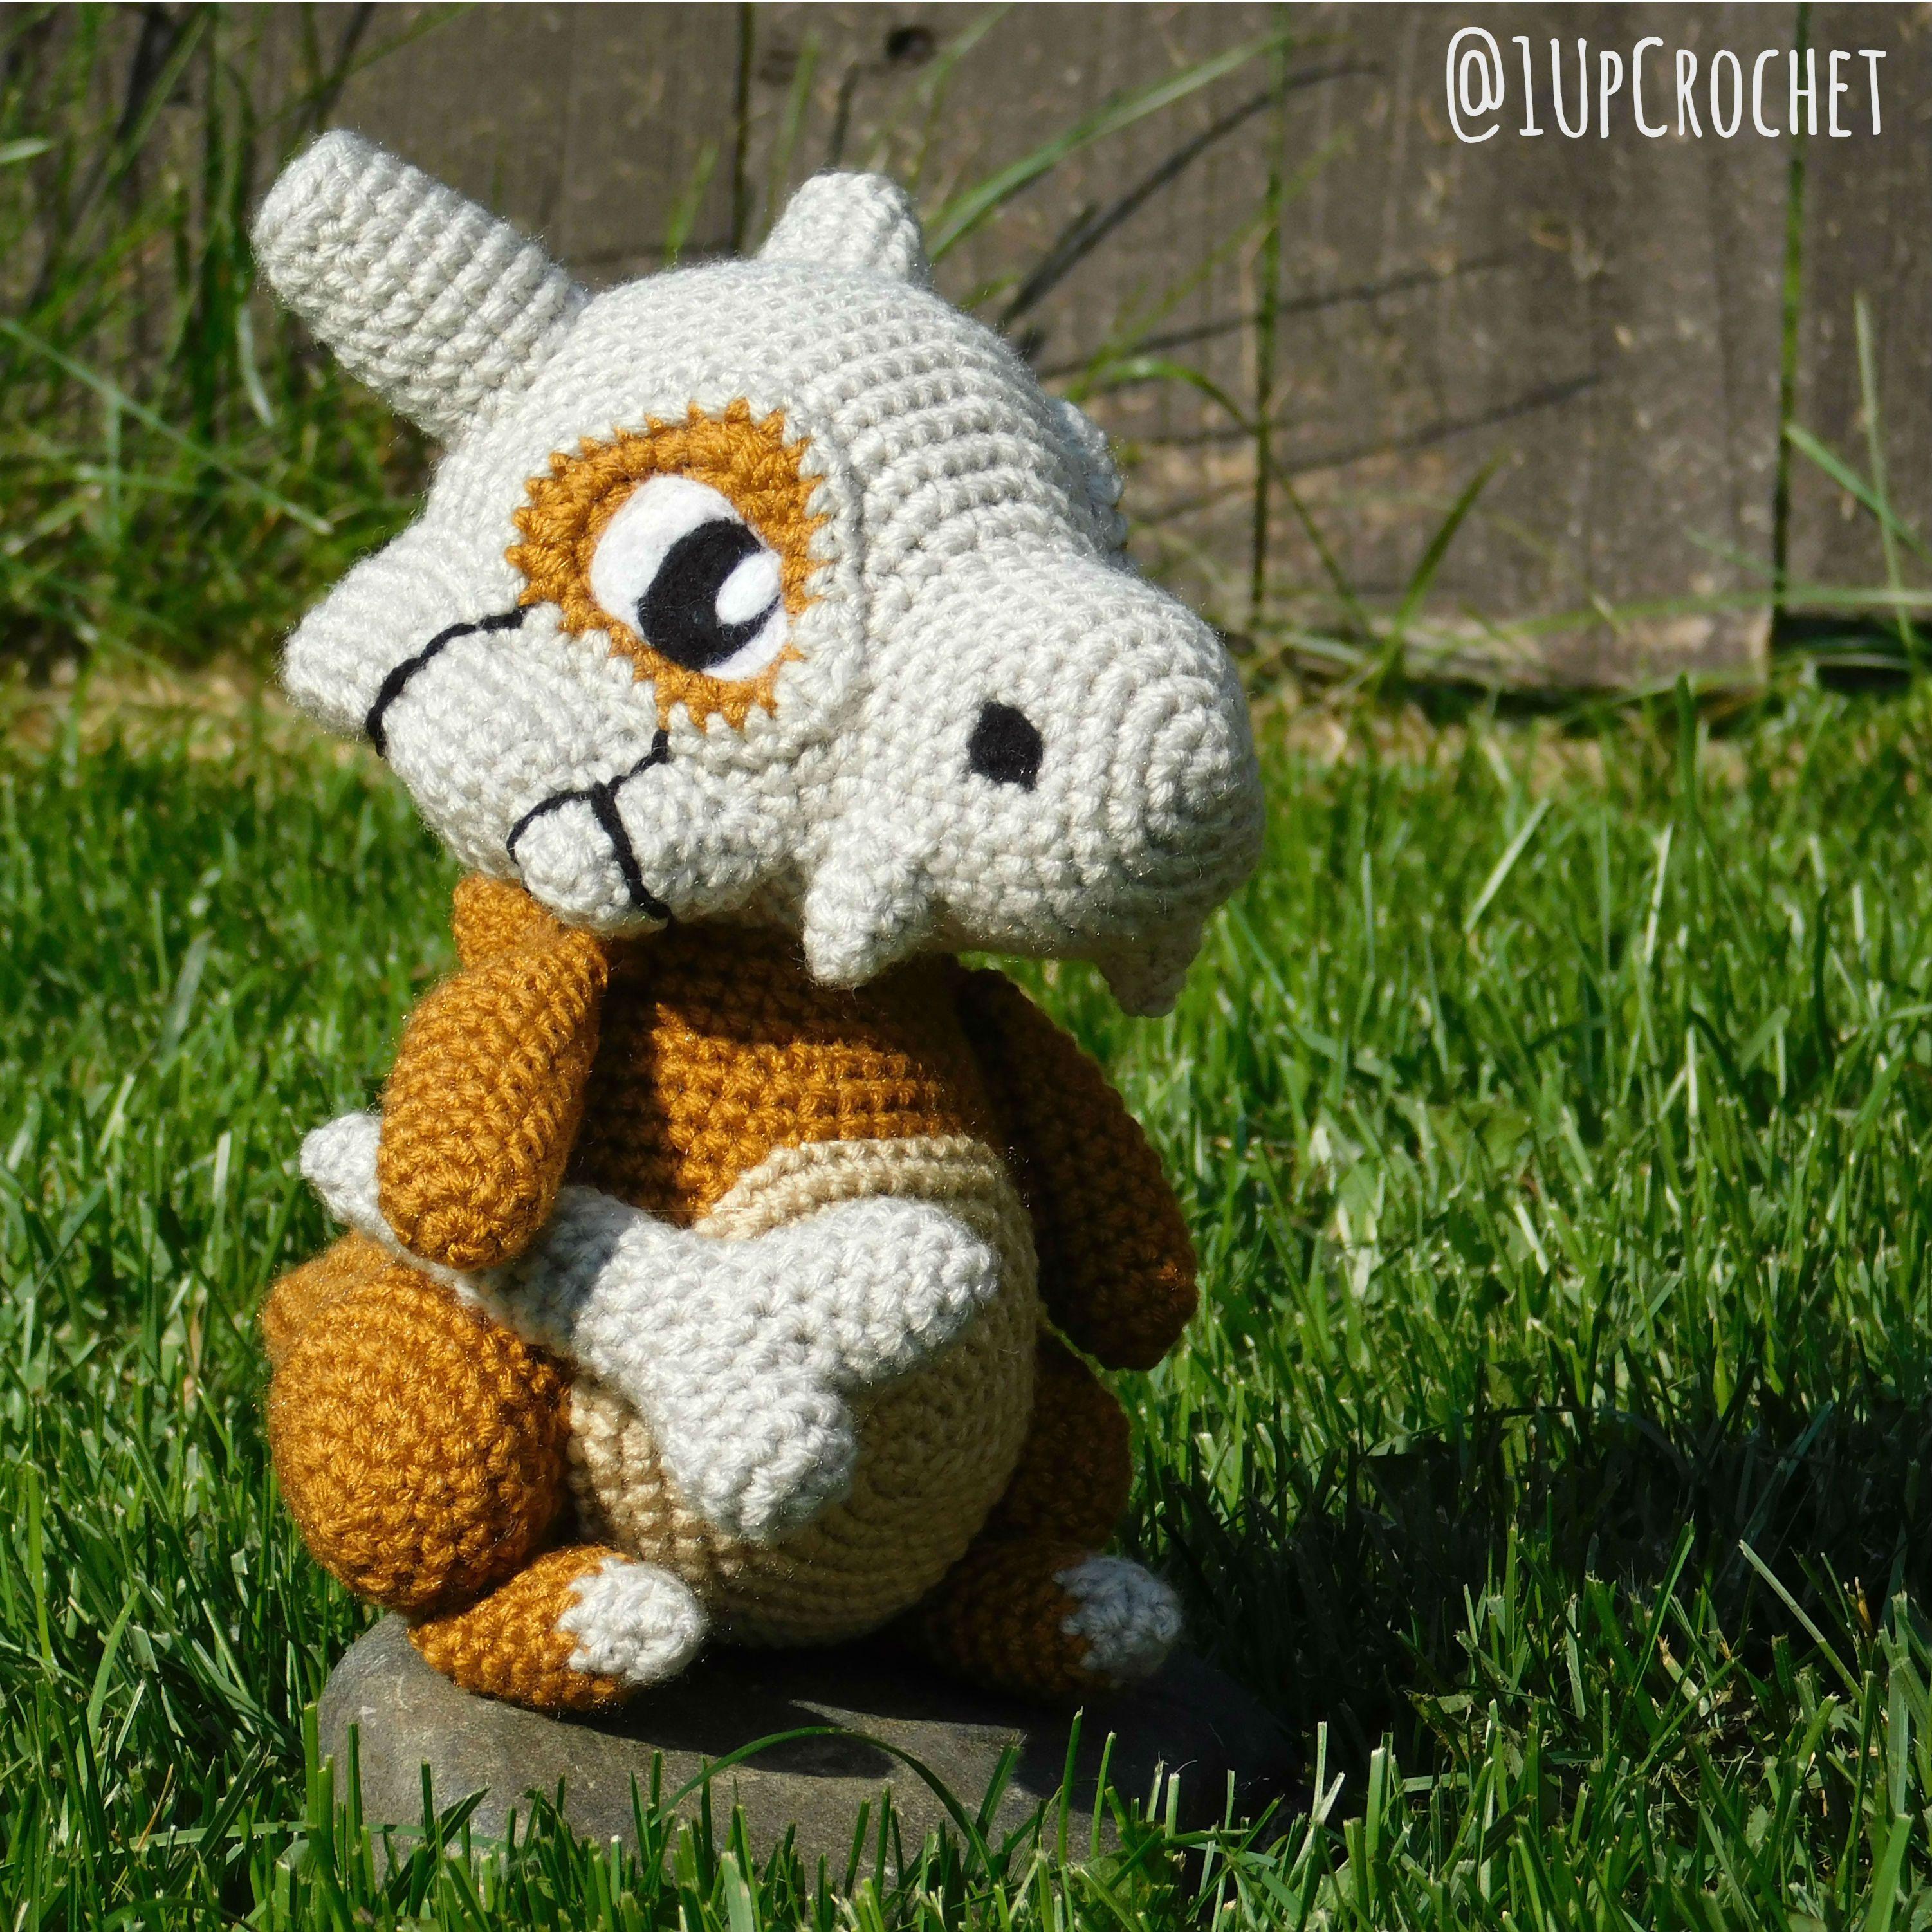 Kawaii Chibi Amigurumi Pattern – Cat, Dog, Bunny, Bear, Duck ... | 3003x3003